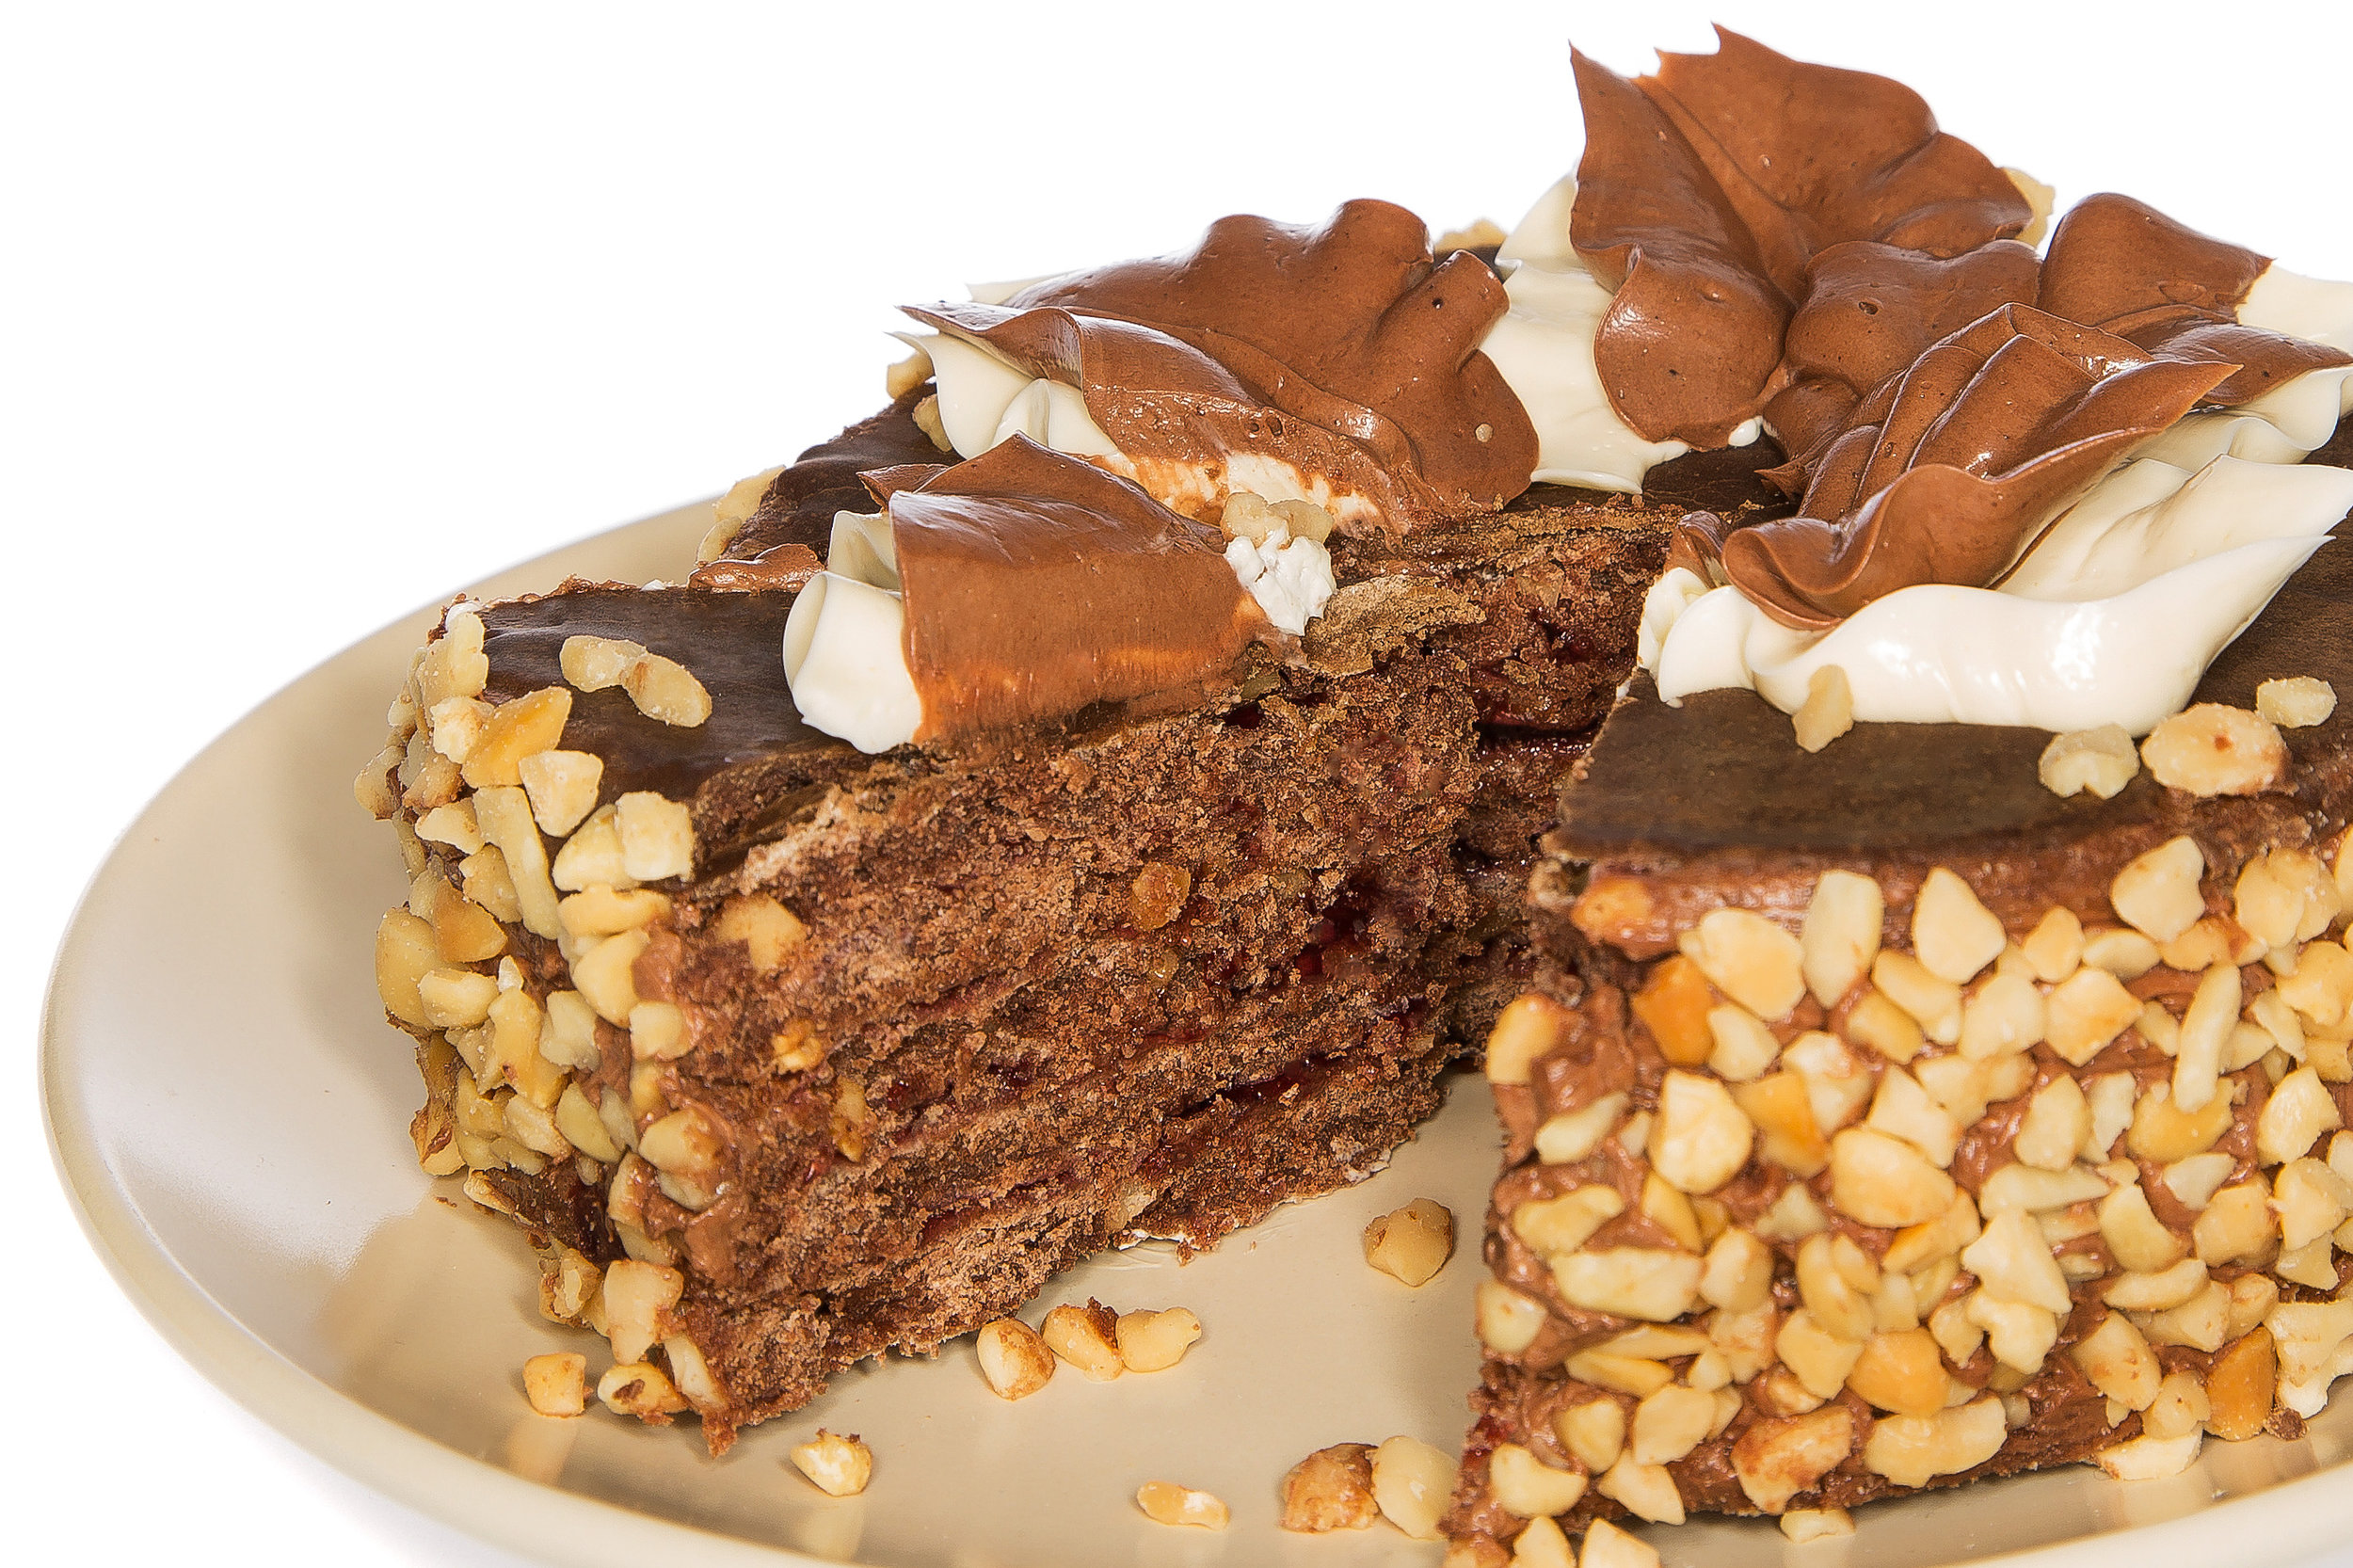 образом торт листопад рецепт с фото краска